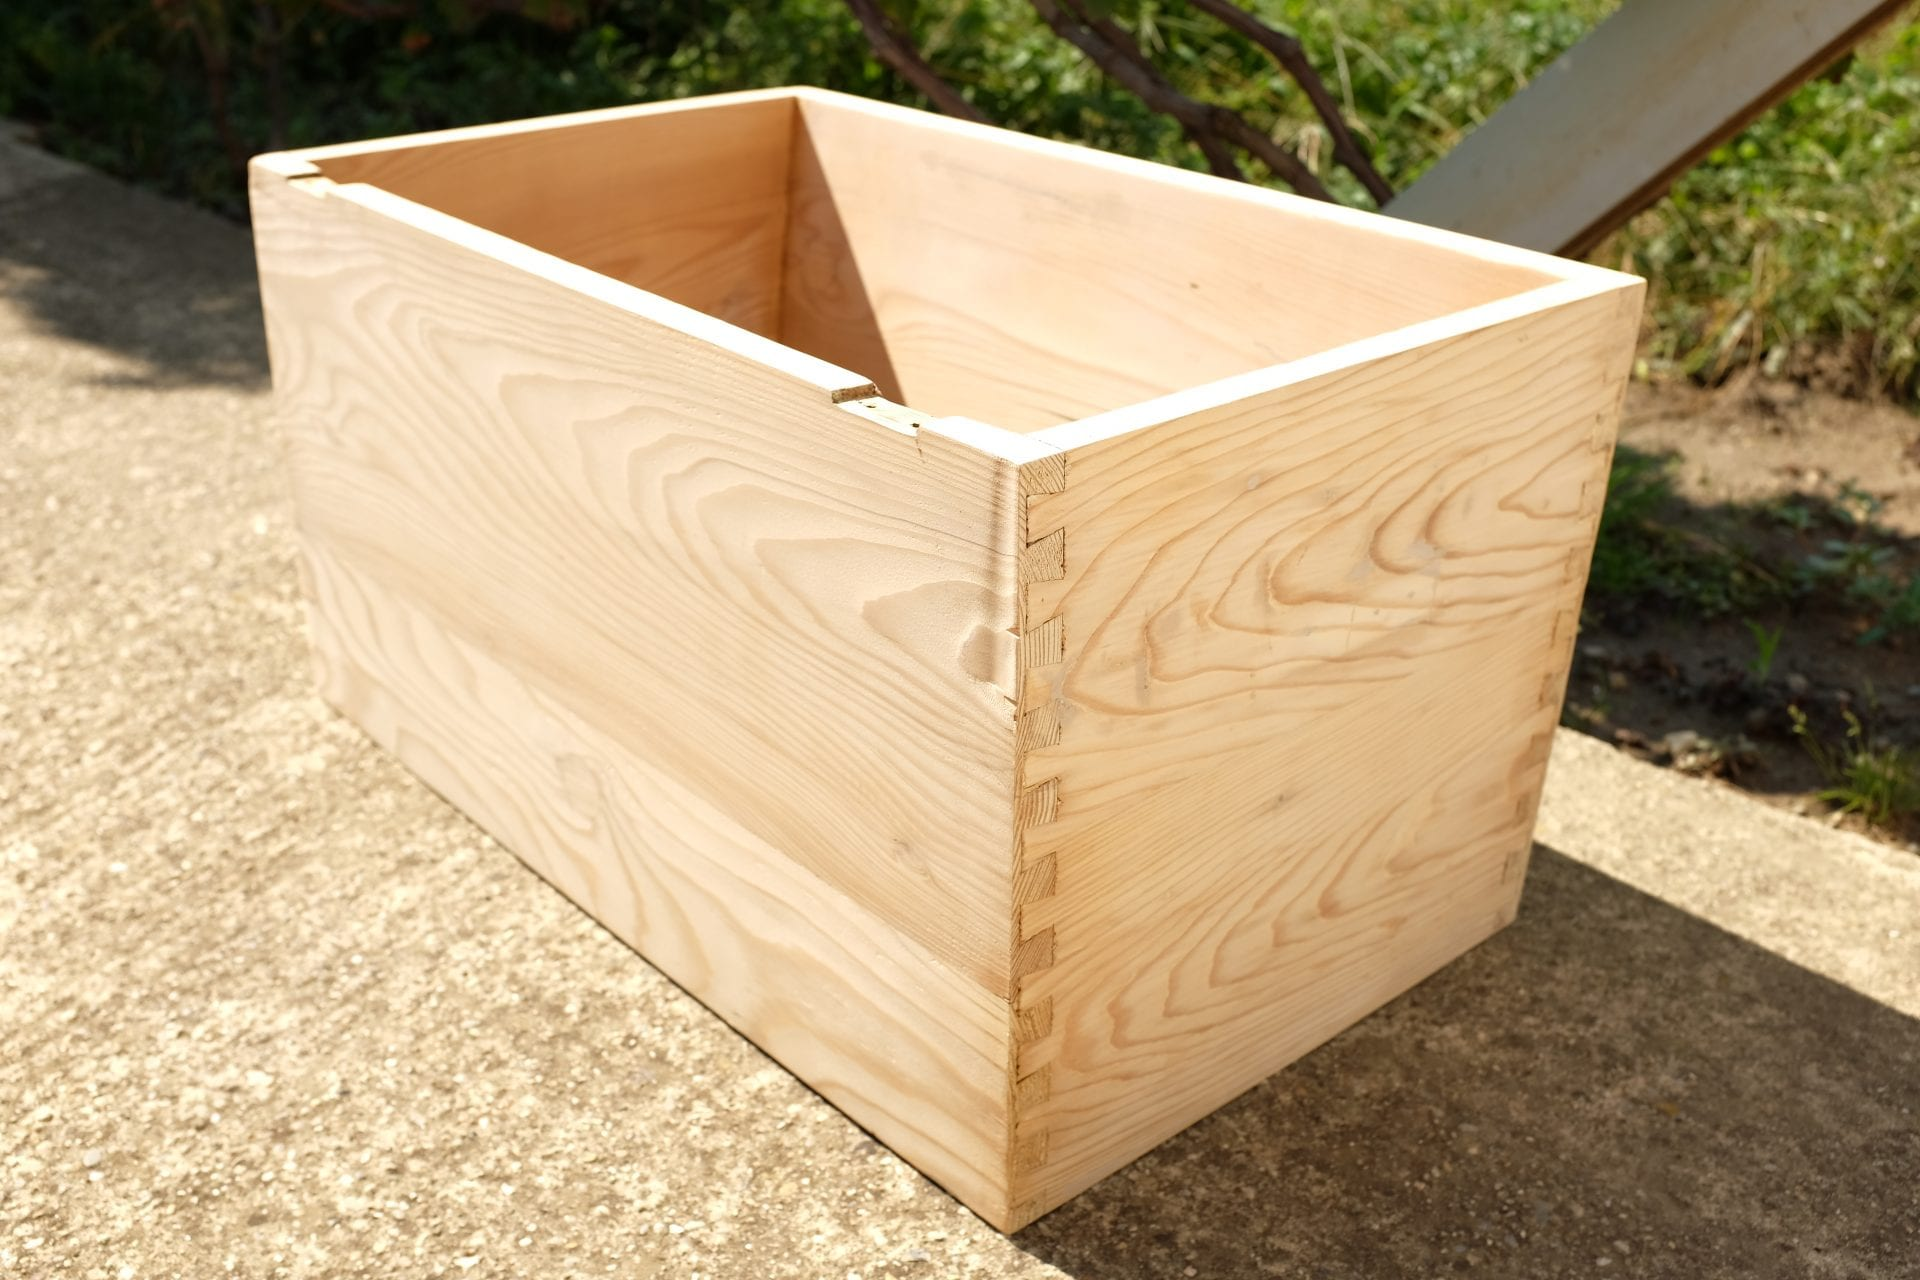 smirglovy-papier-uprava-dreva-hoblovanie-prirodzeny-vzhlad-dreva